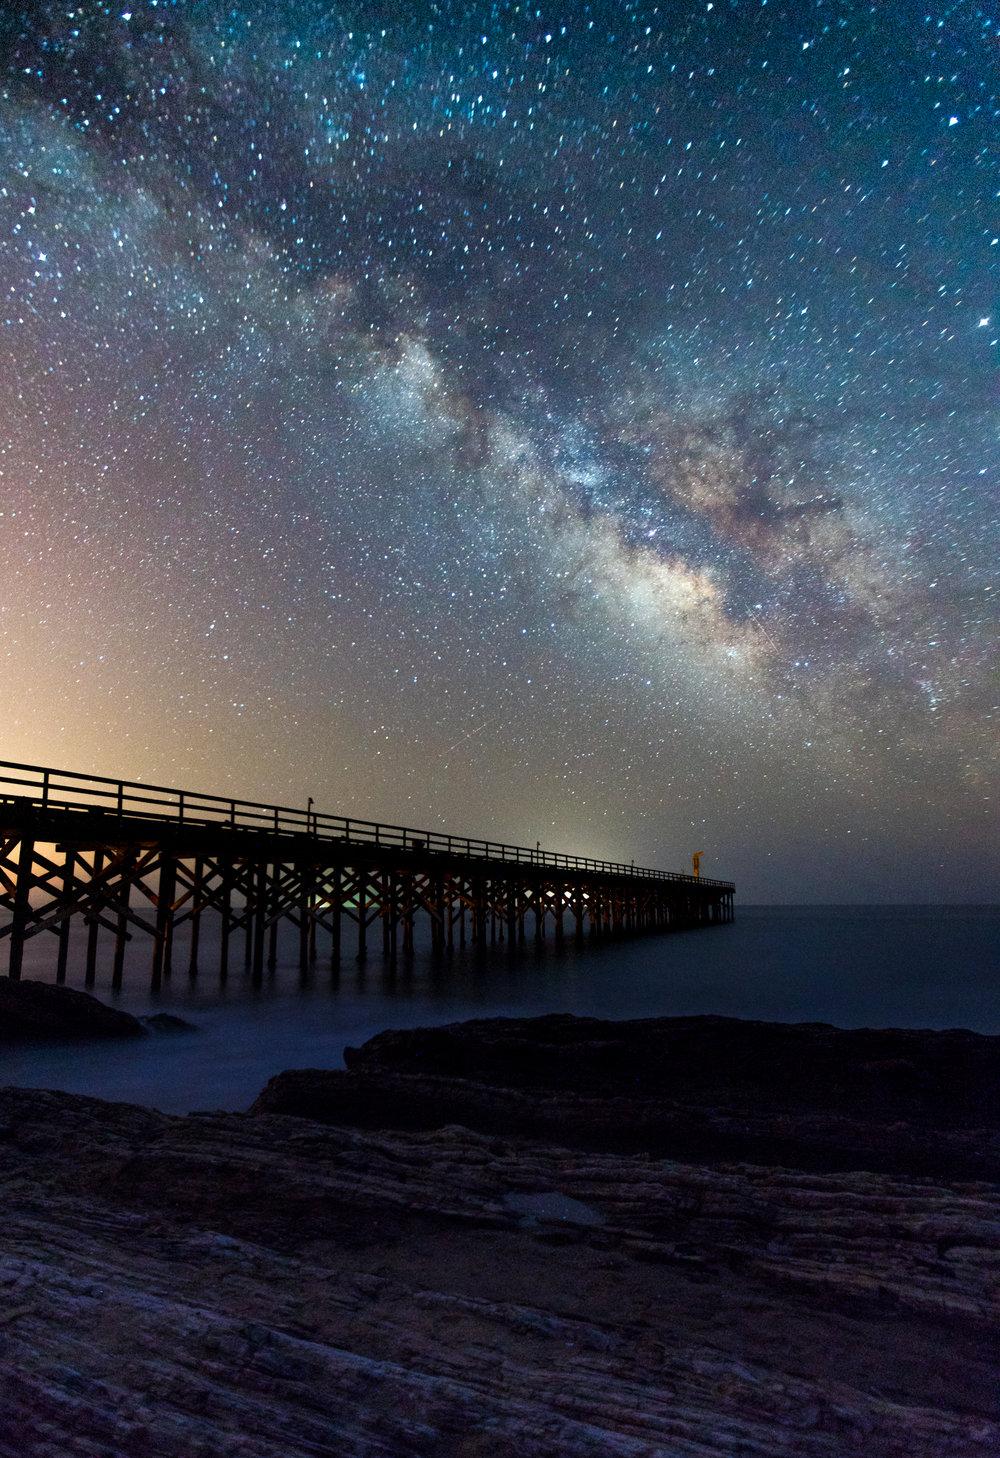 DW_AstroPhoto021.jpg